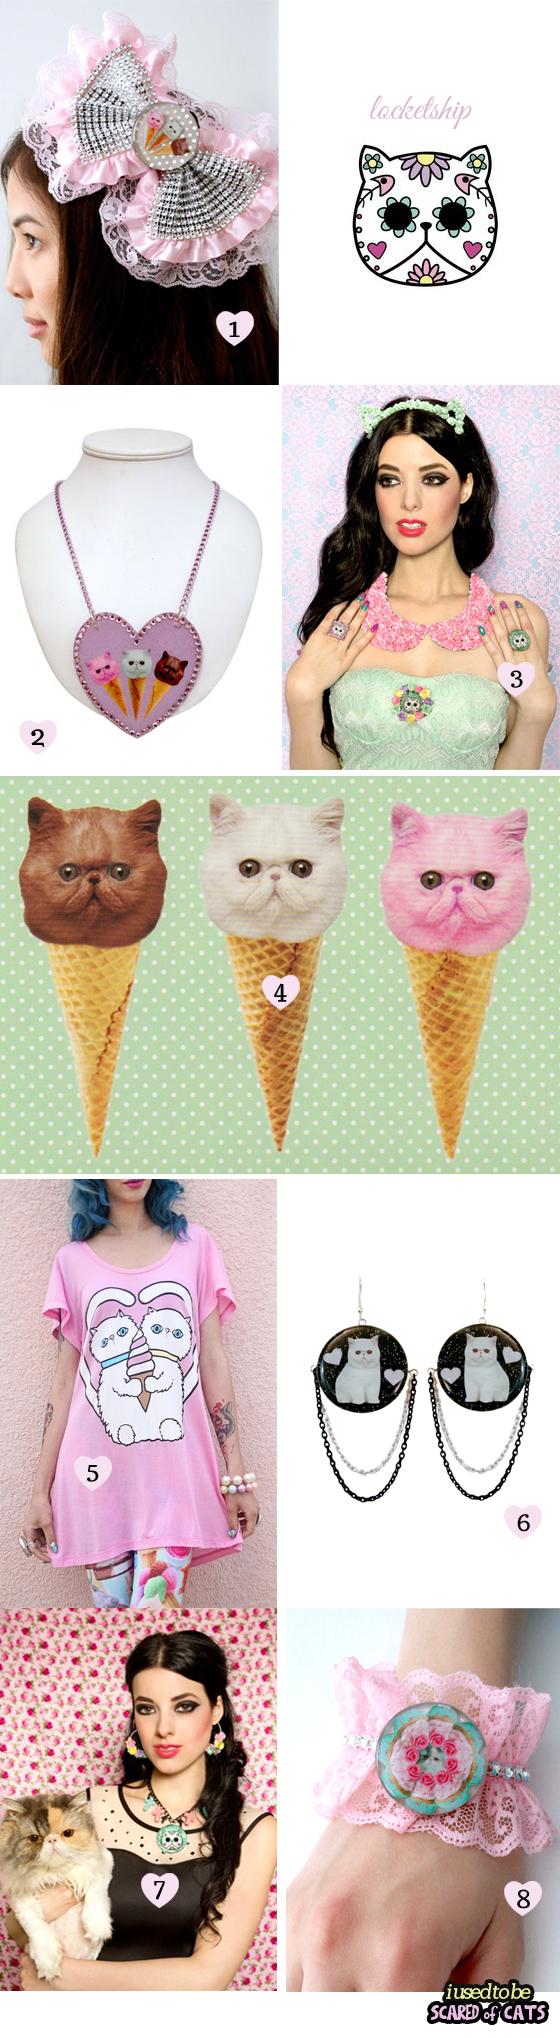 locketship cat products